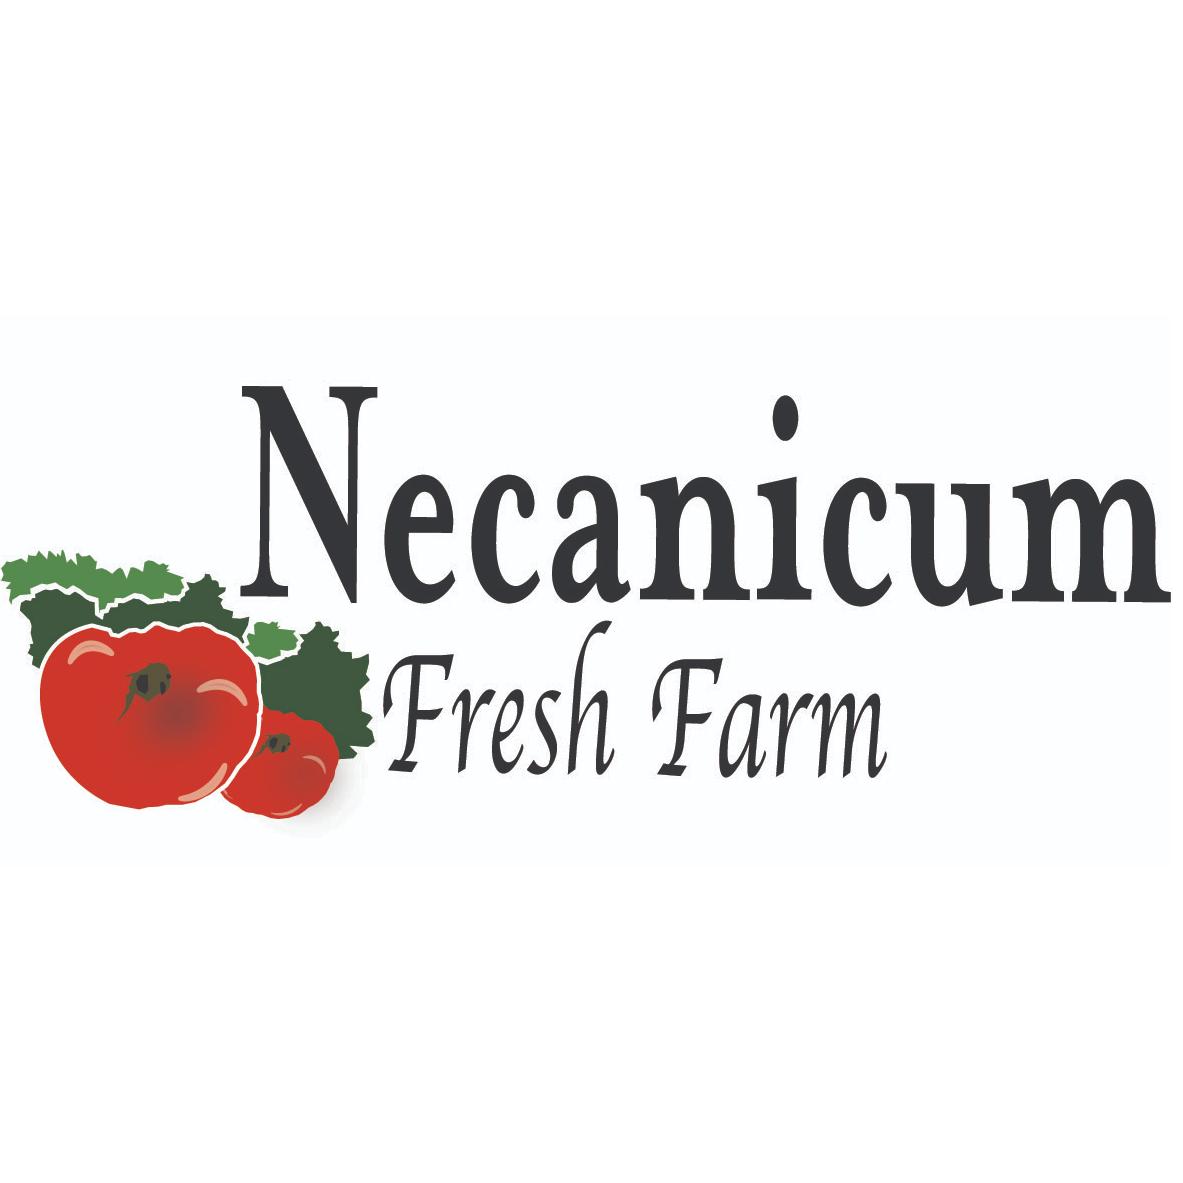 Necanicum Fresh Farm